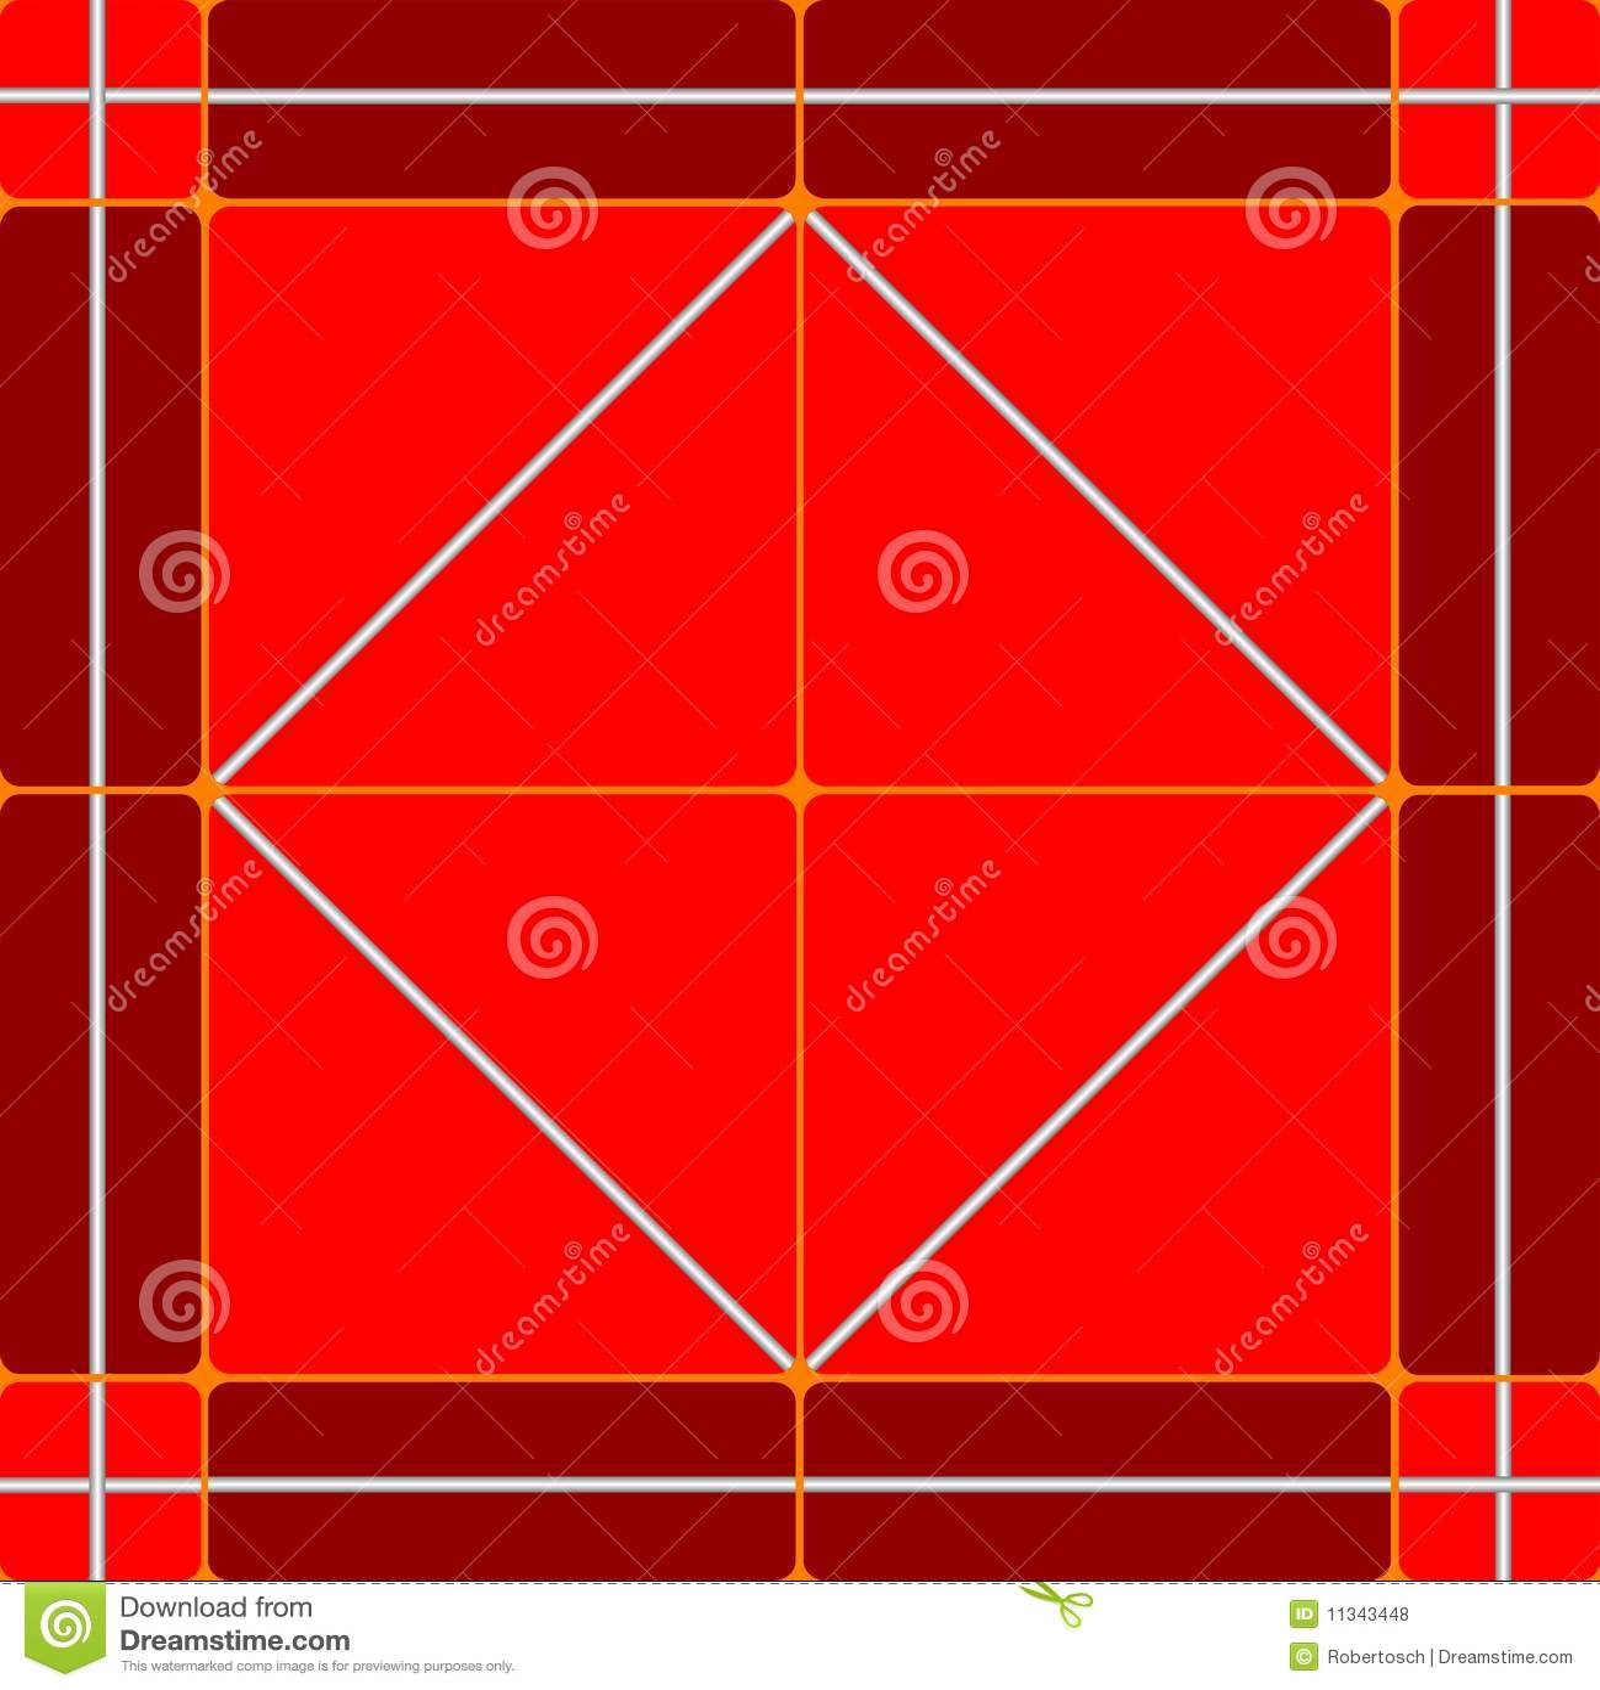 Red Ceramic Tiles Royalty Free Stock Photos Image 11343448